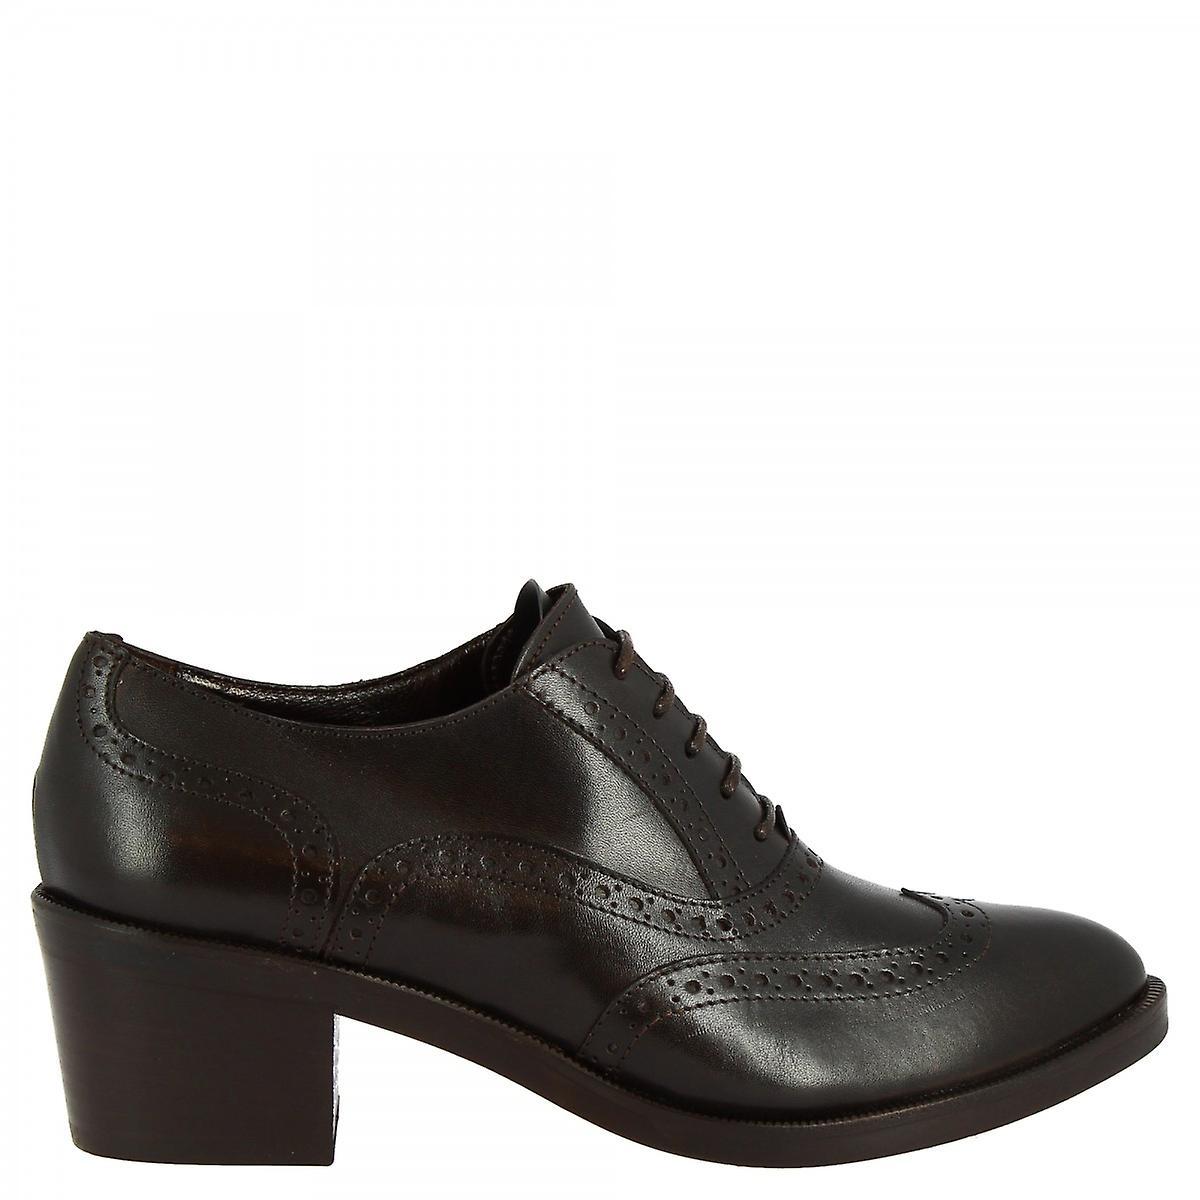 Leonardo Shoes Women's handmade heels oxfords shoes in dark brown calf leather